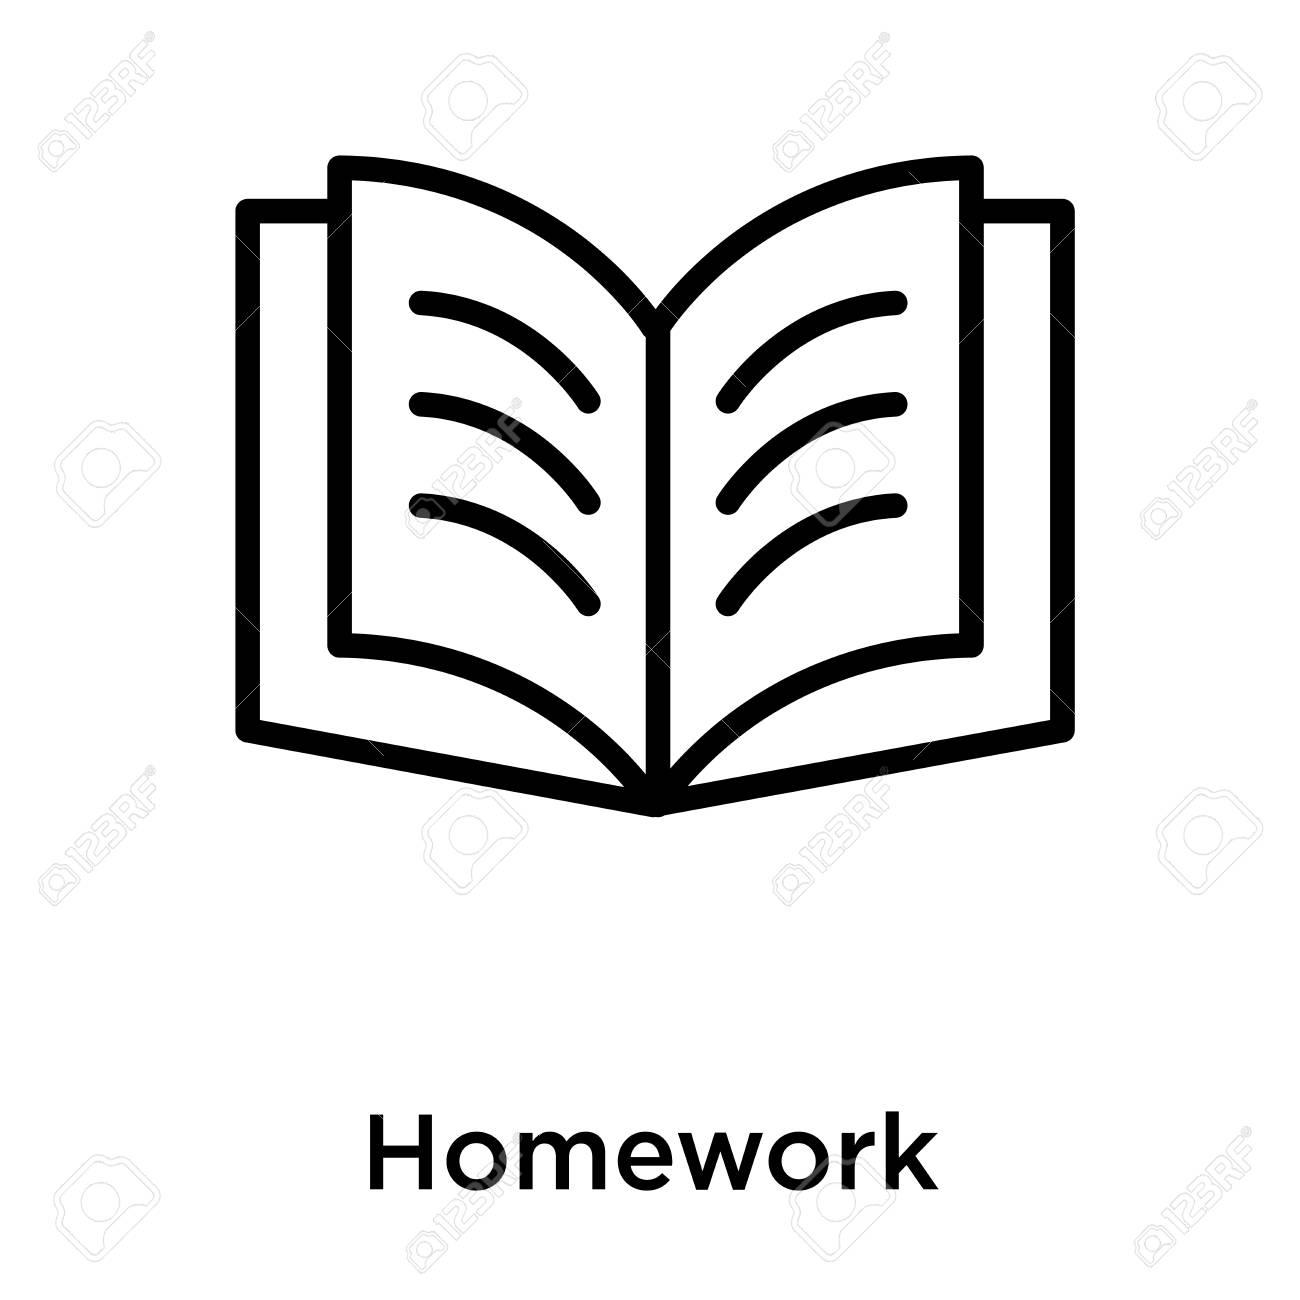 homework icon isolated on white background, vector illustration